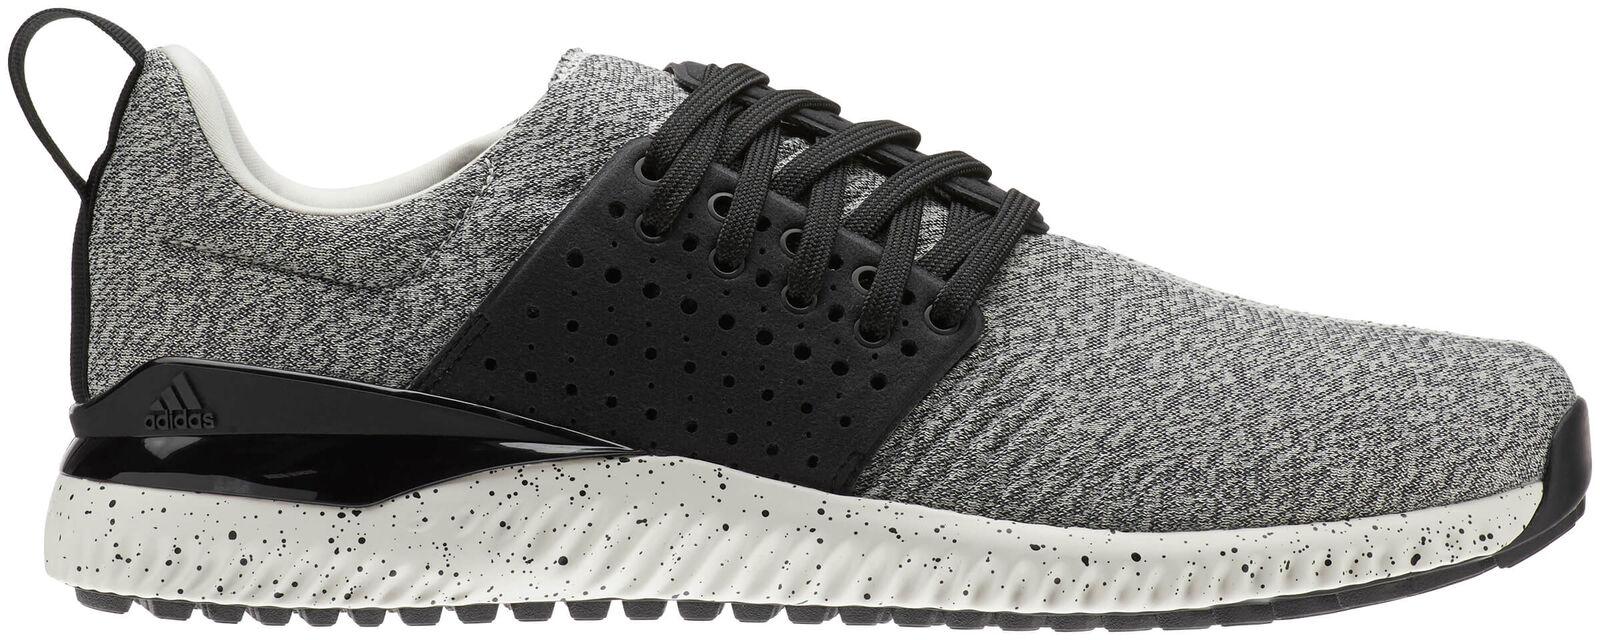 Adidas Adicross Bounce Golf Shoes BB7814 Raw White/Black Men's New - Choose Size